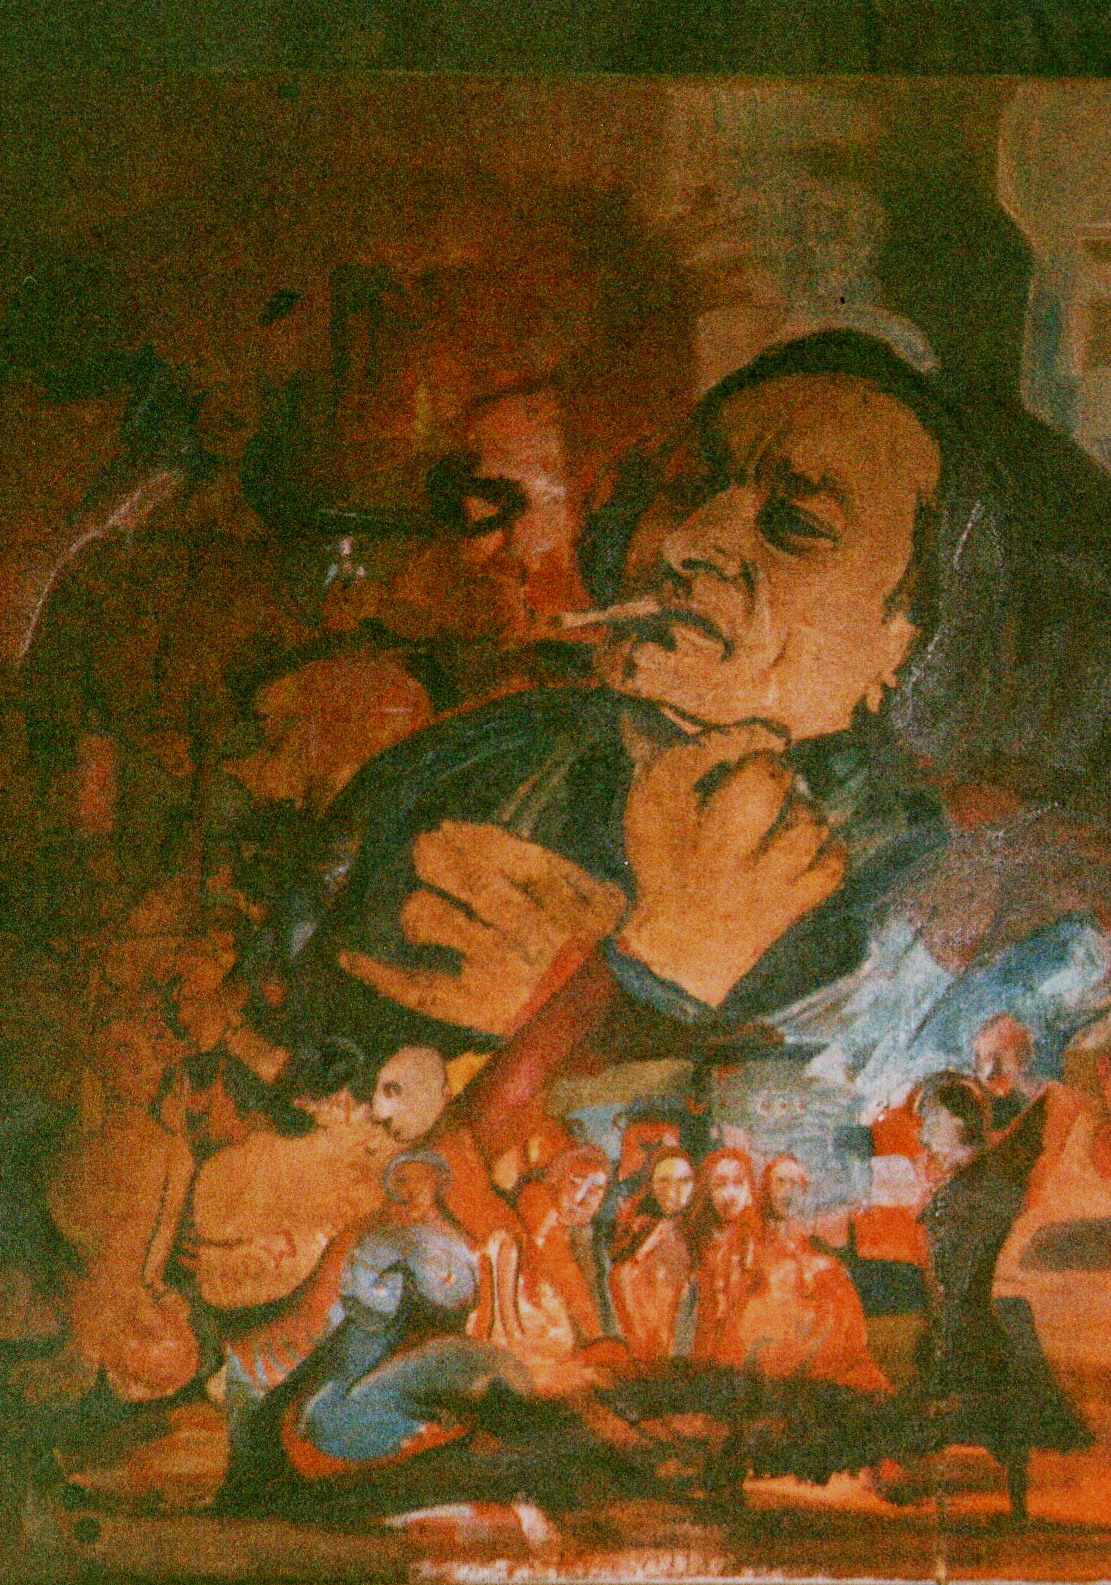 Artaud. Le suicidé de la société